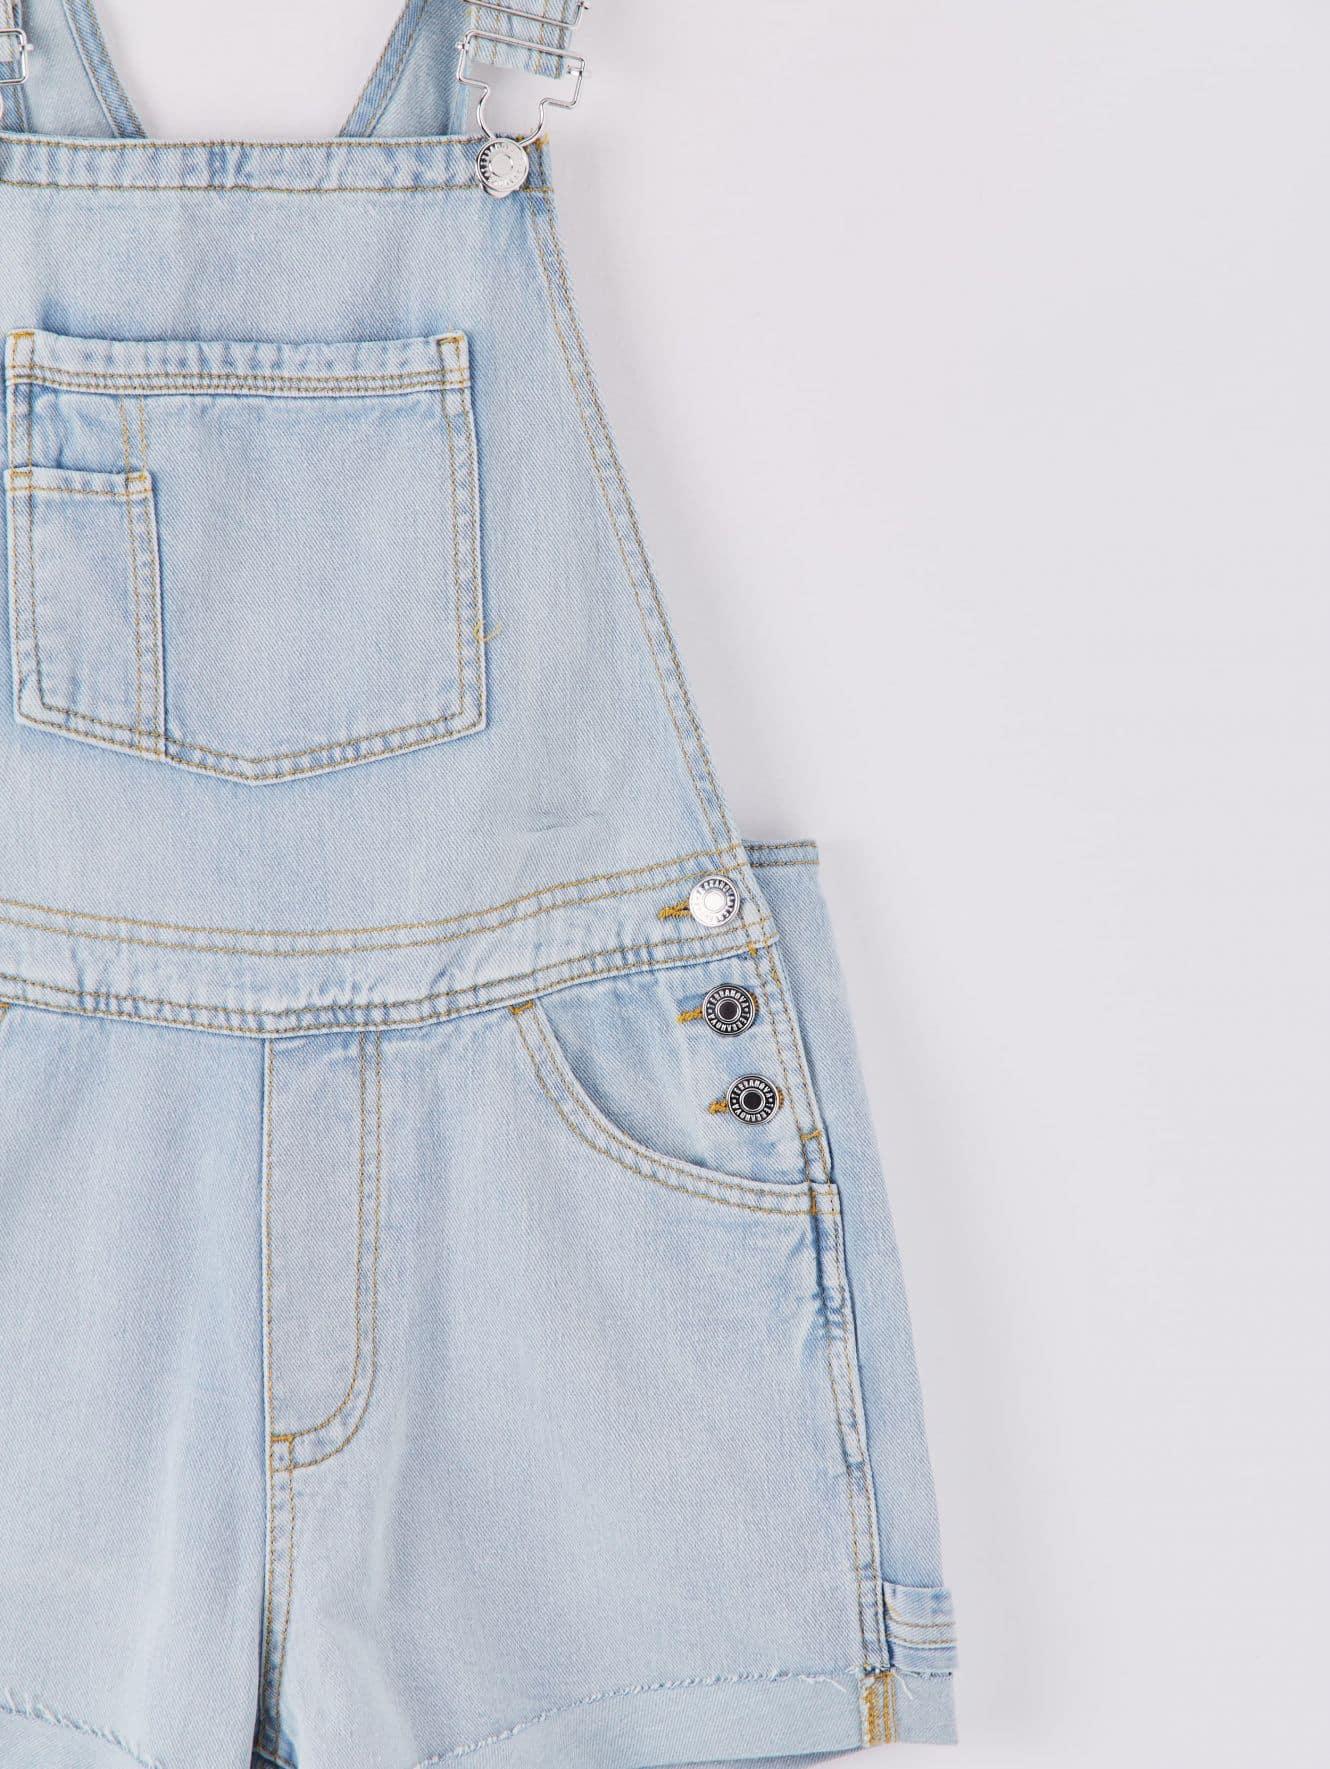 Pantalone Jeans Corto Donna Terranova